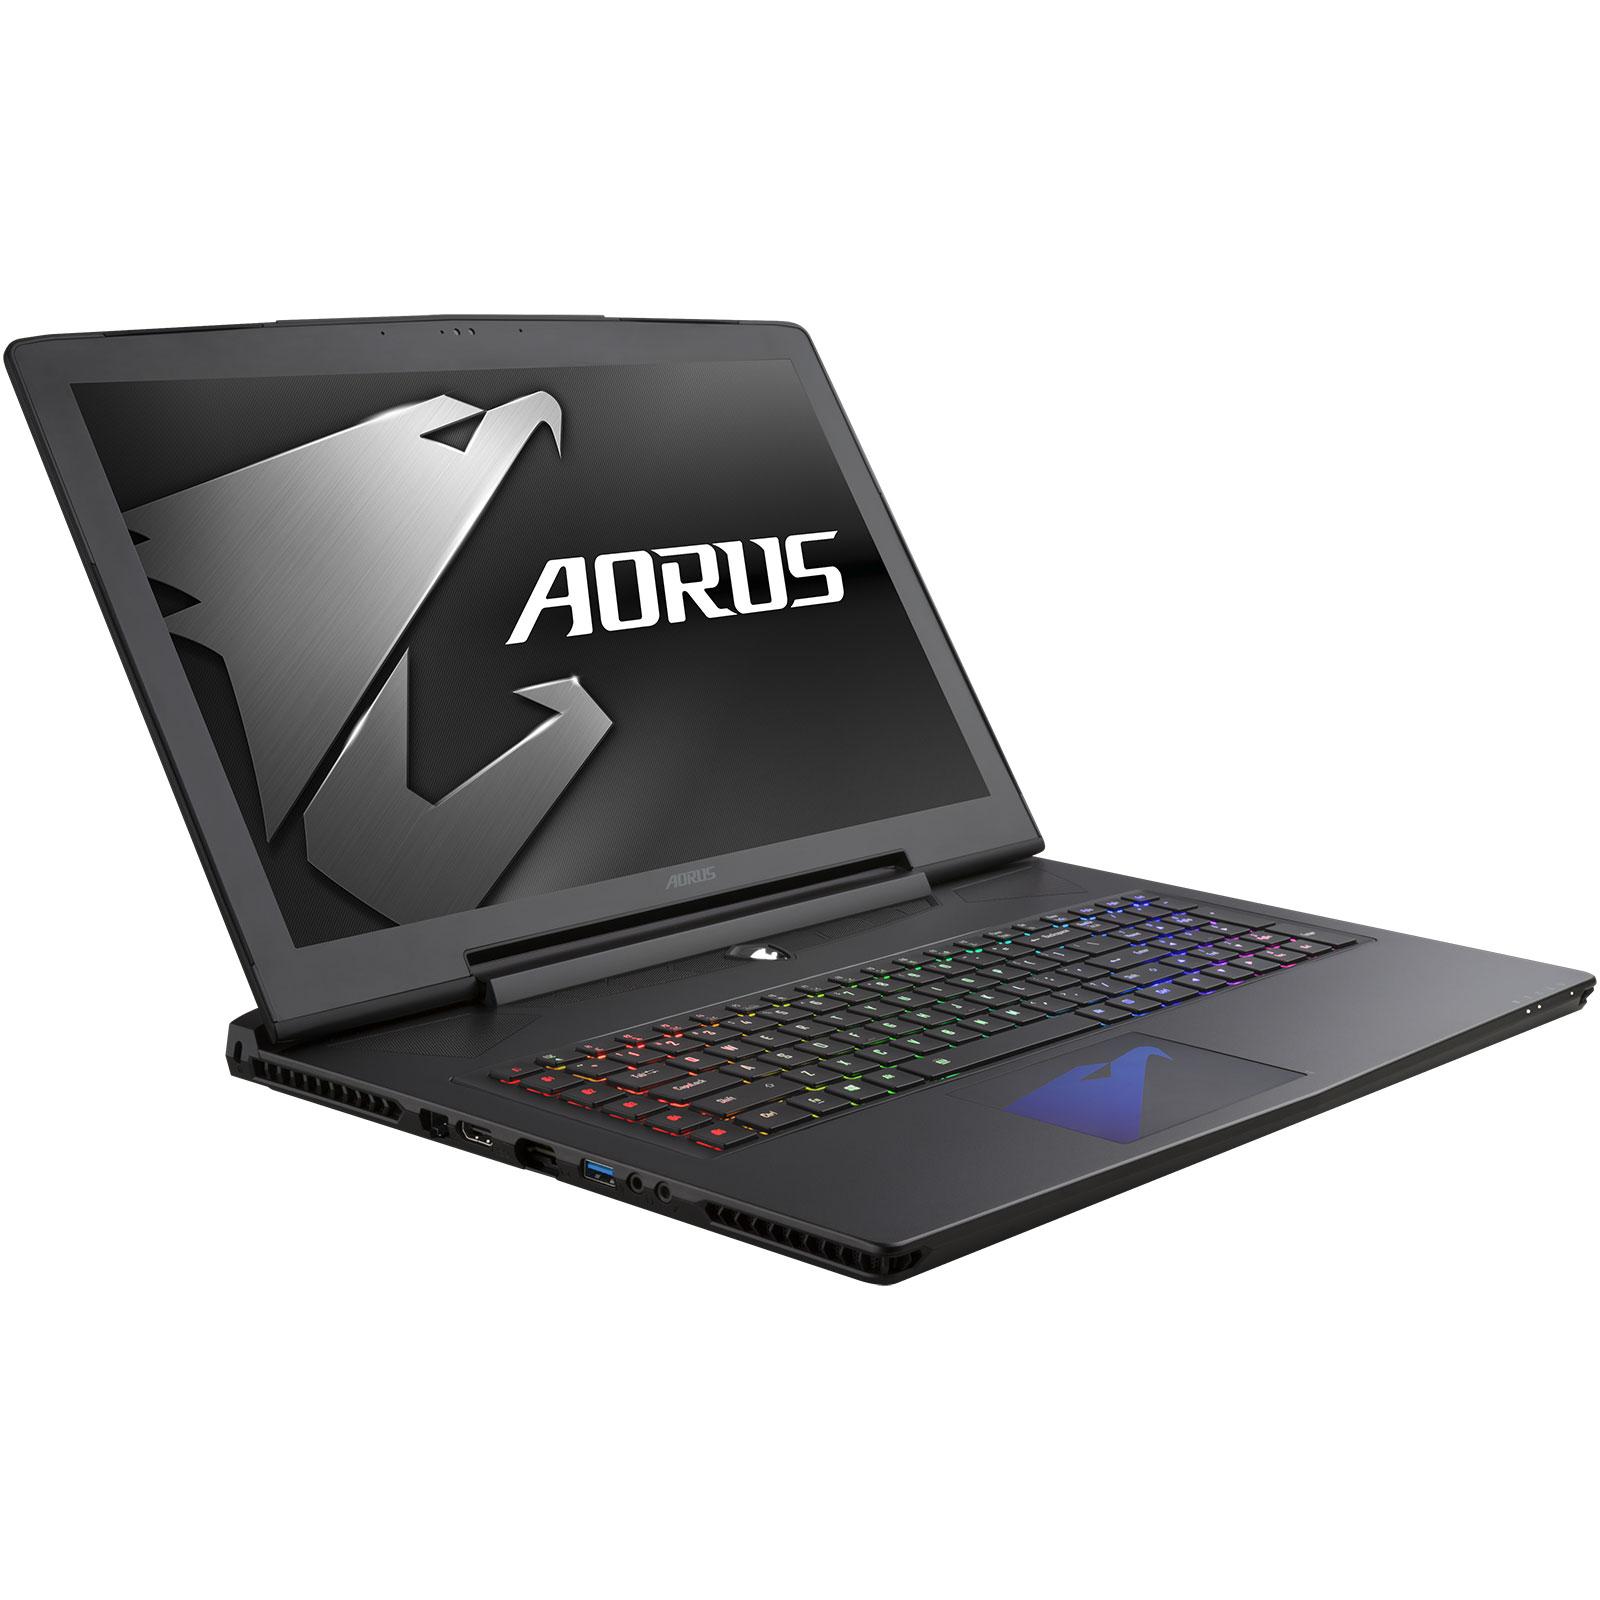 "PC portable AORUS X5 v6 K1NW10-FR Intel Core i7-6820HK 16 Go SSD 256 Go + HDD 1 To 15.6"" LED G-SYNC NVIDIA GeForce GTX 1070 8 Go Wi-Fi AC/Bluetooth Webcam Windows 10 Famille 64 bits"